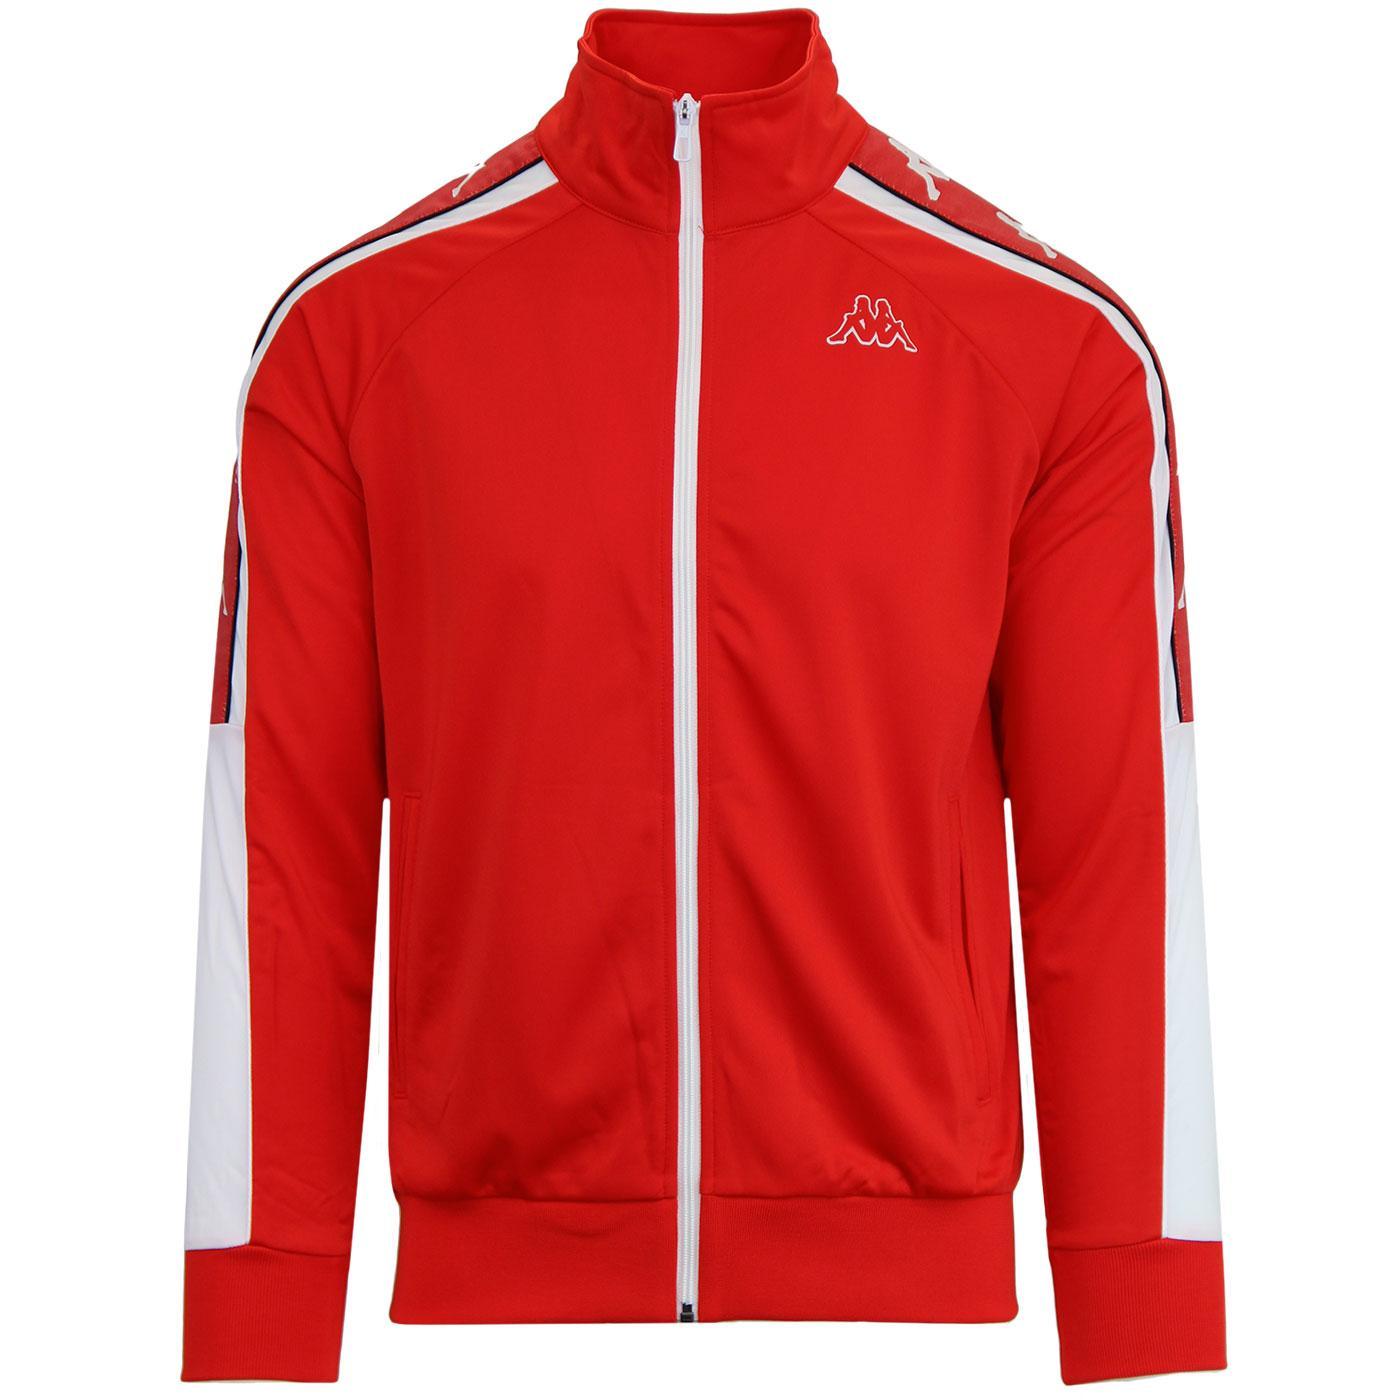 Banda Ahran KAPPA Retro 90s Track Jacket Red/White